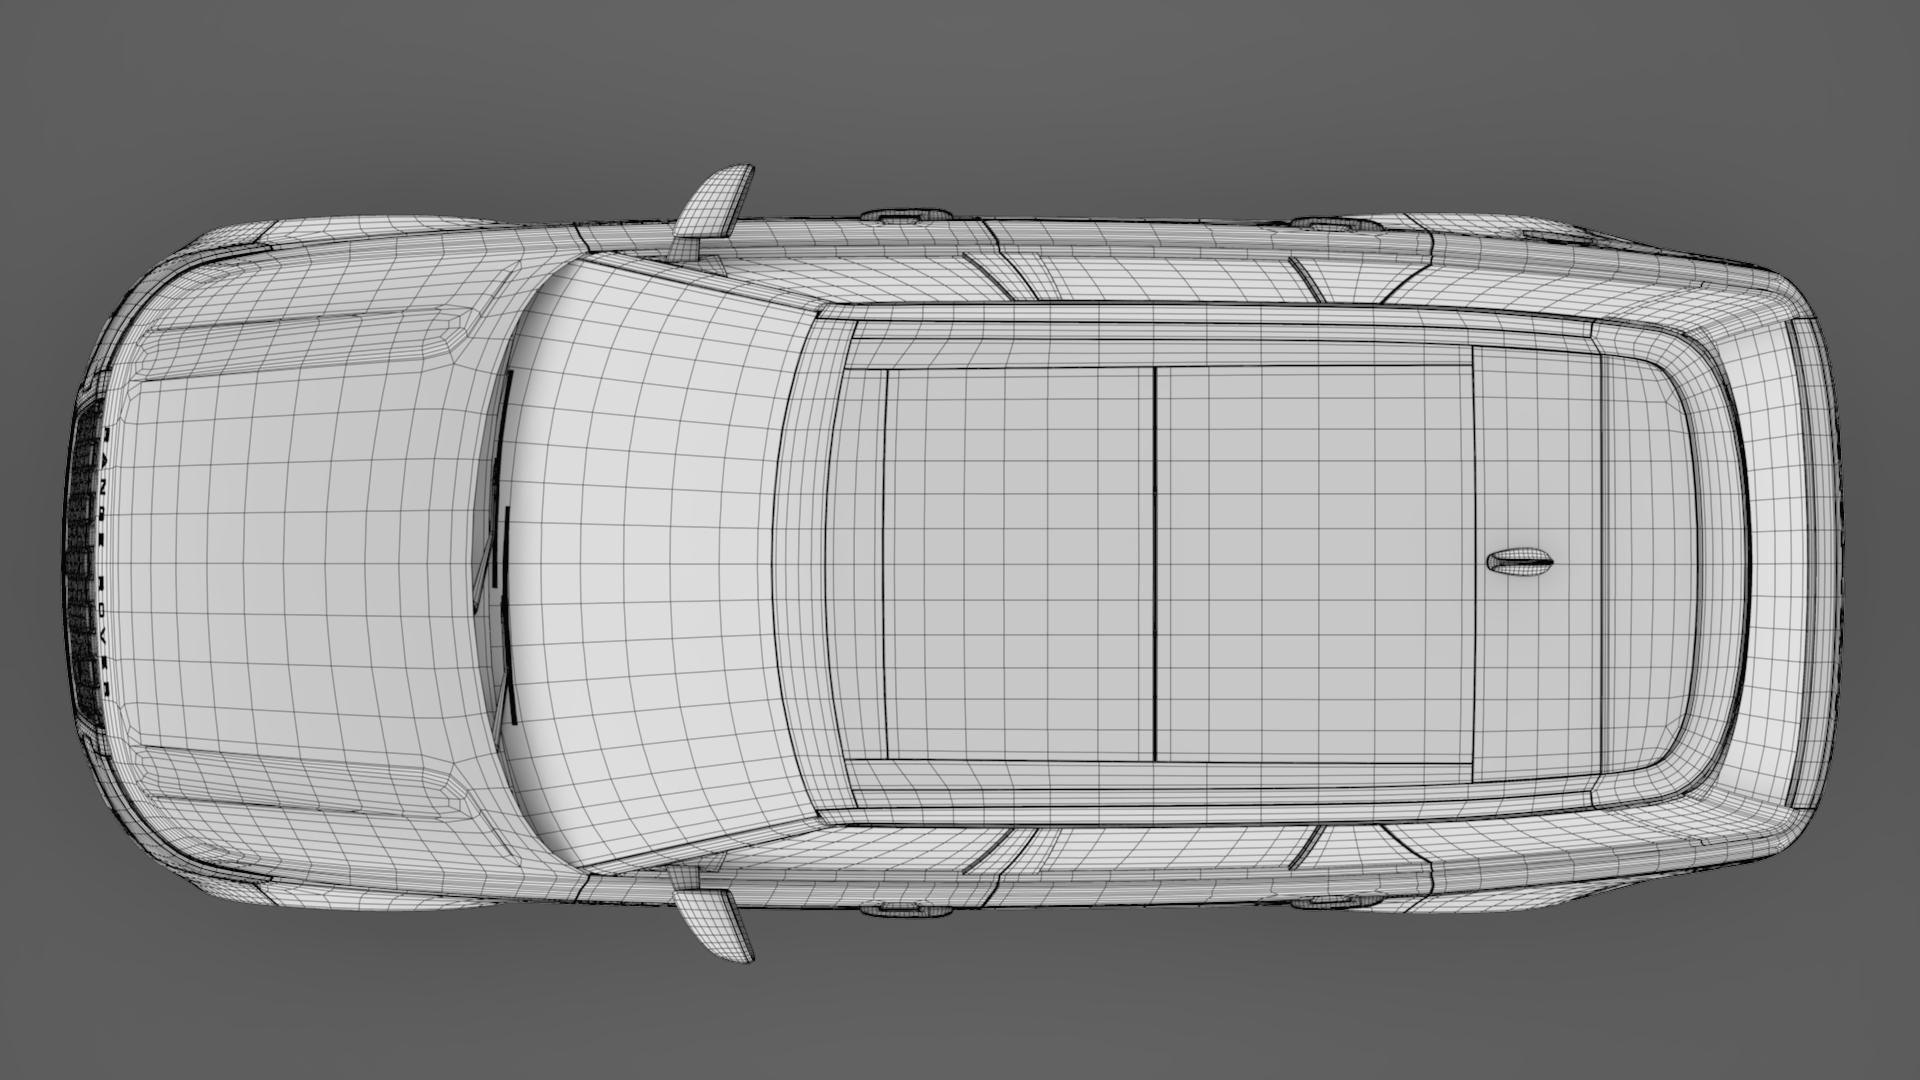 range rover autobiography hybrid lwb l405 2018 3d model max fbx c4d lwo ma mb hrc xsi obj 277314